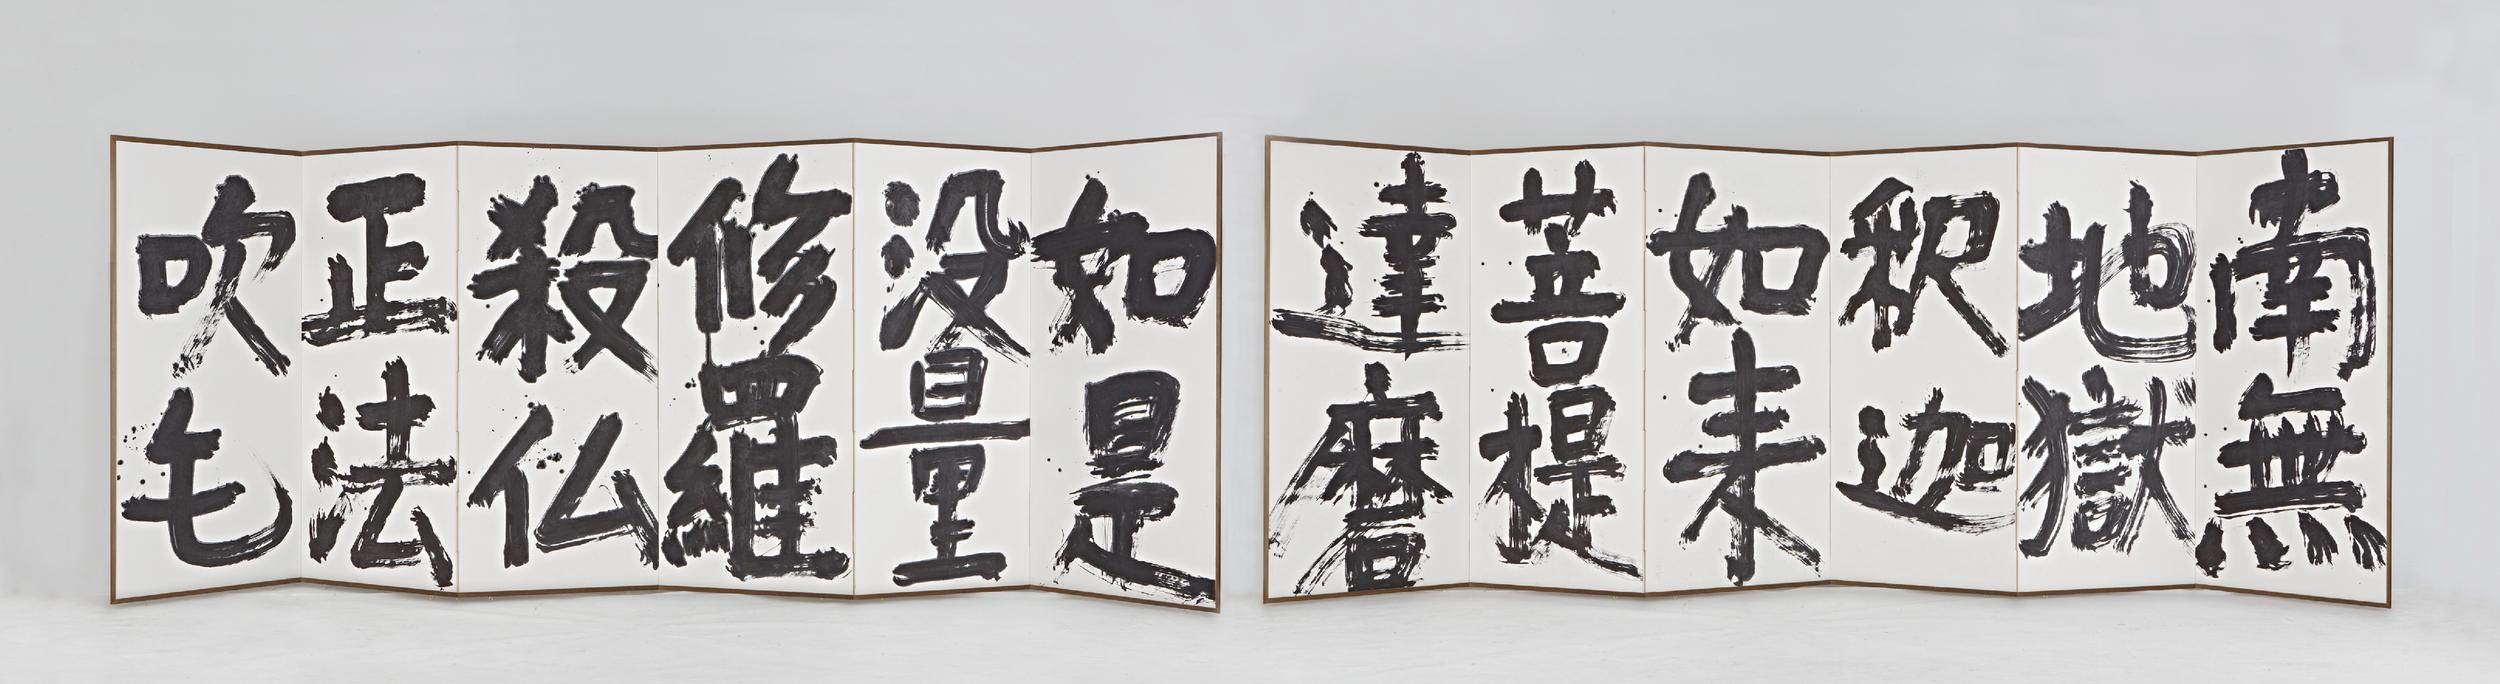 Morihiro_Hosokawa (2).png